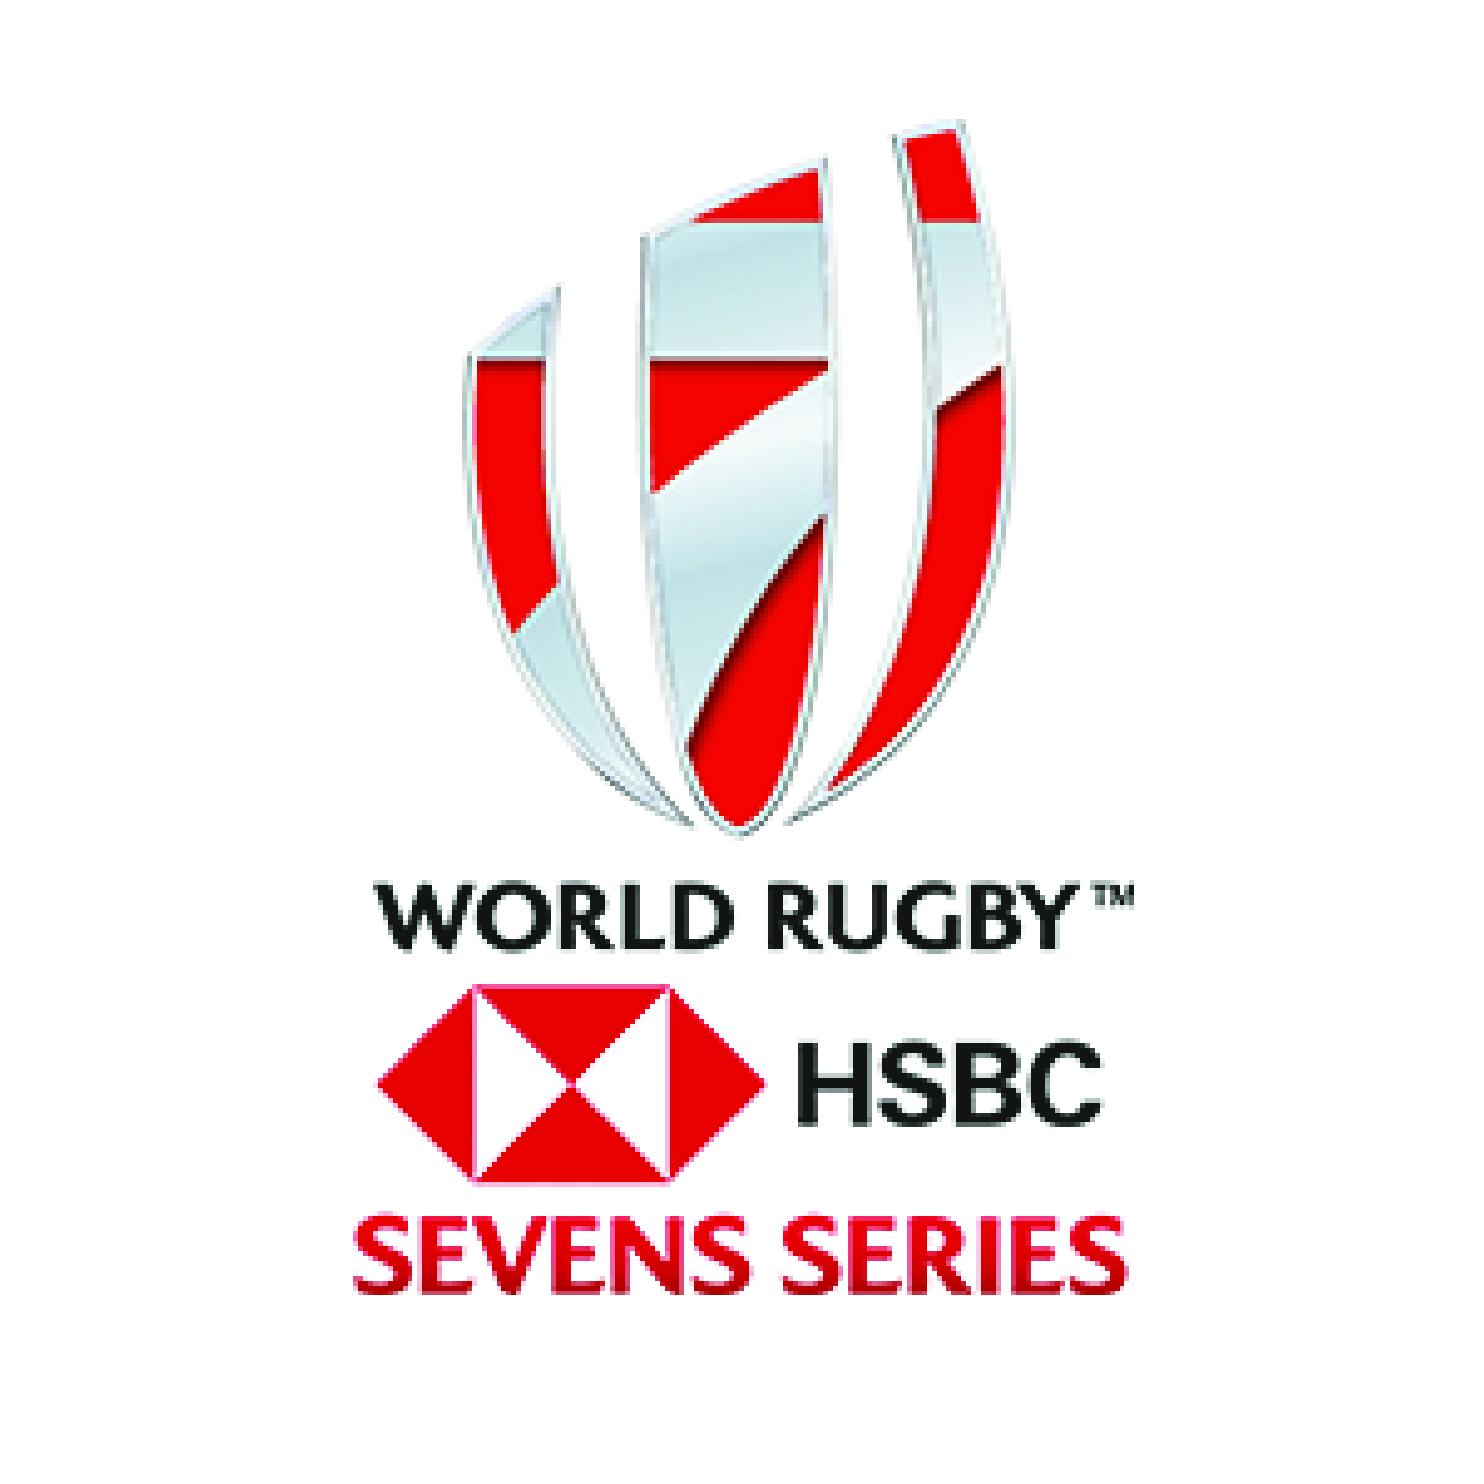 HSBC Sevens Series